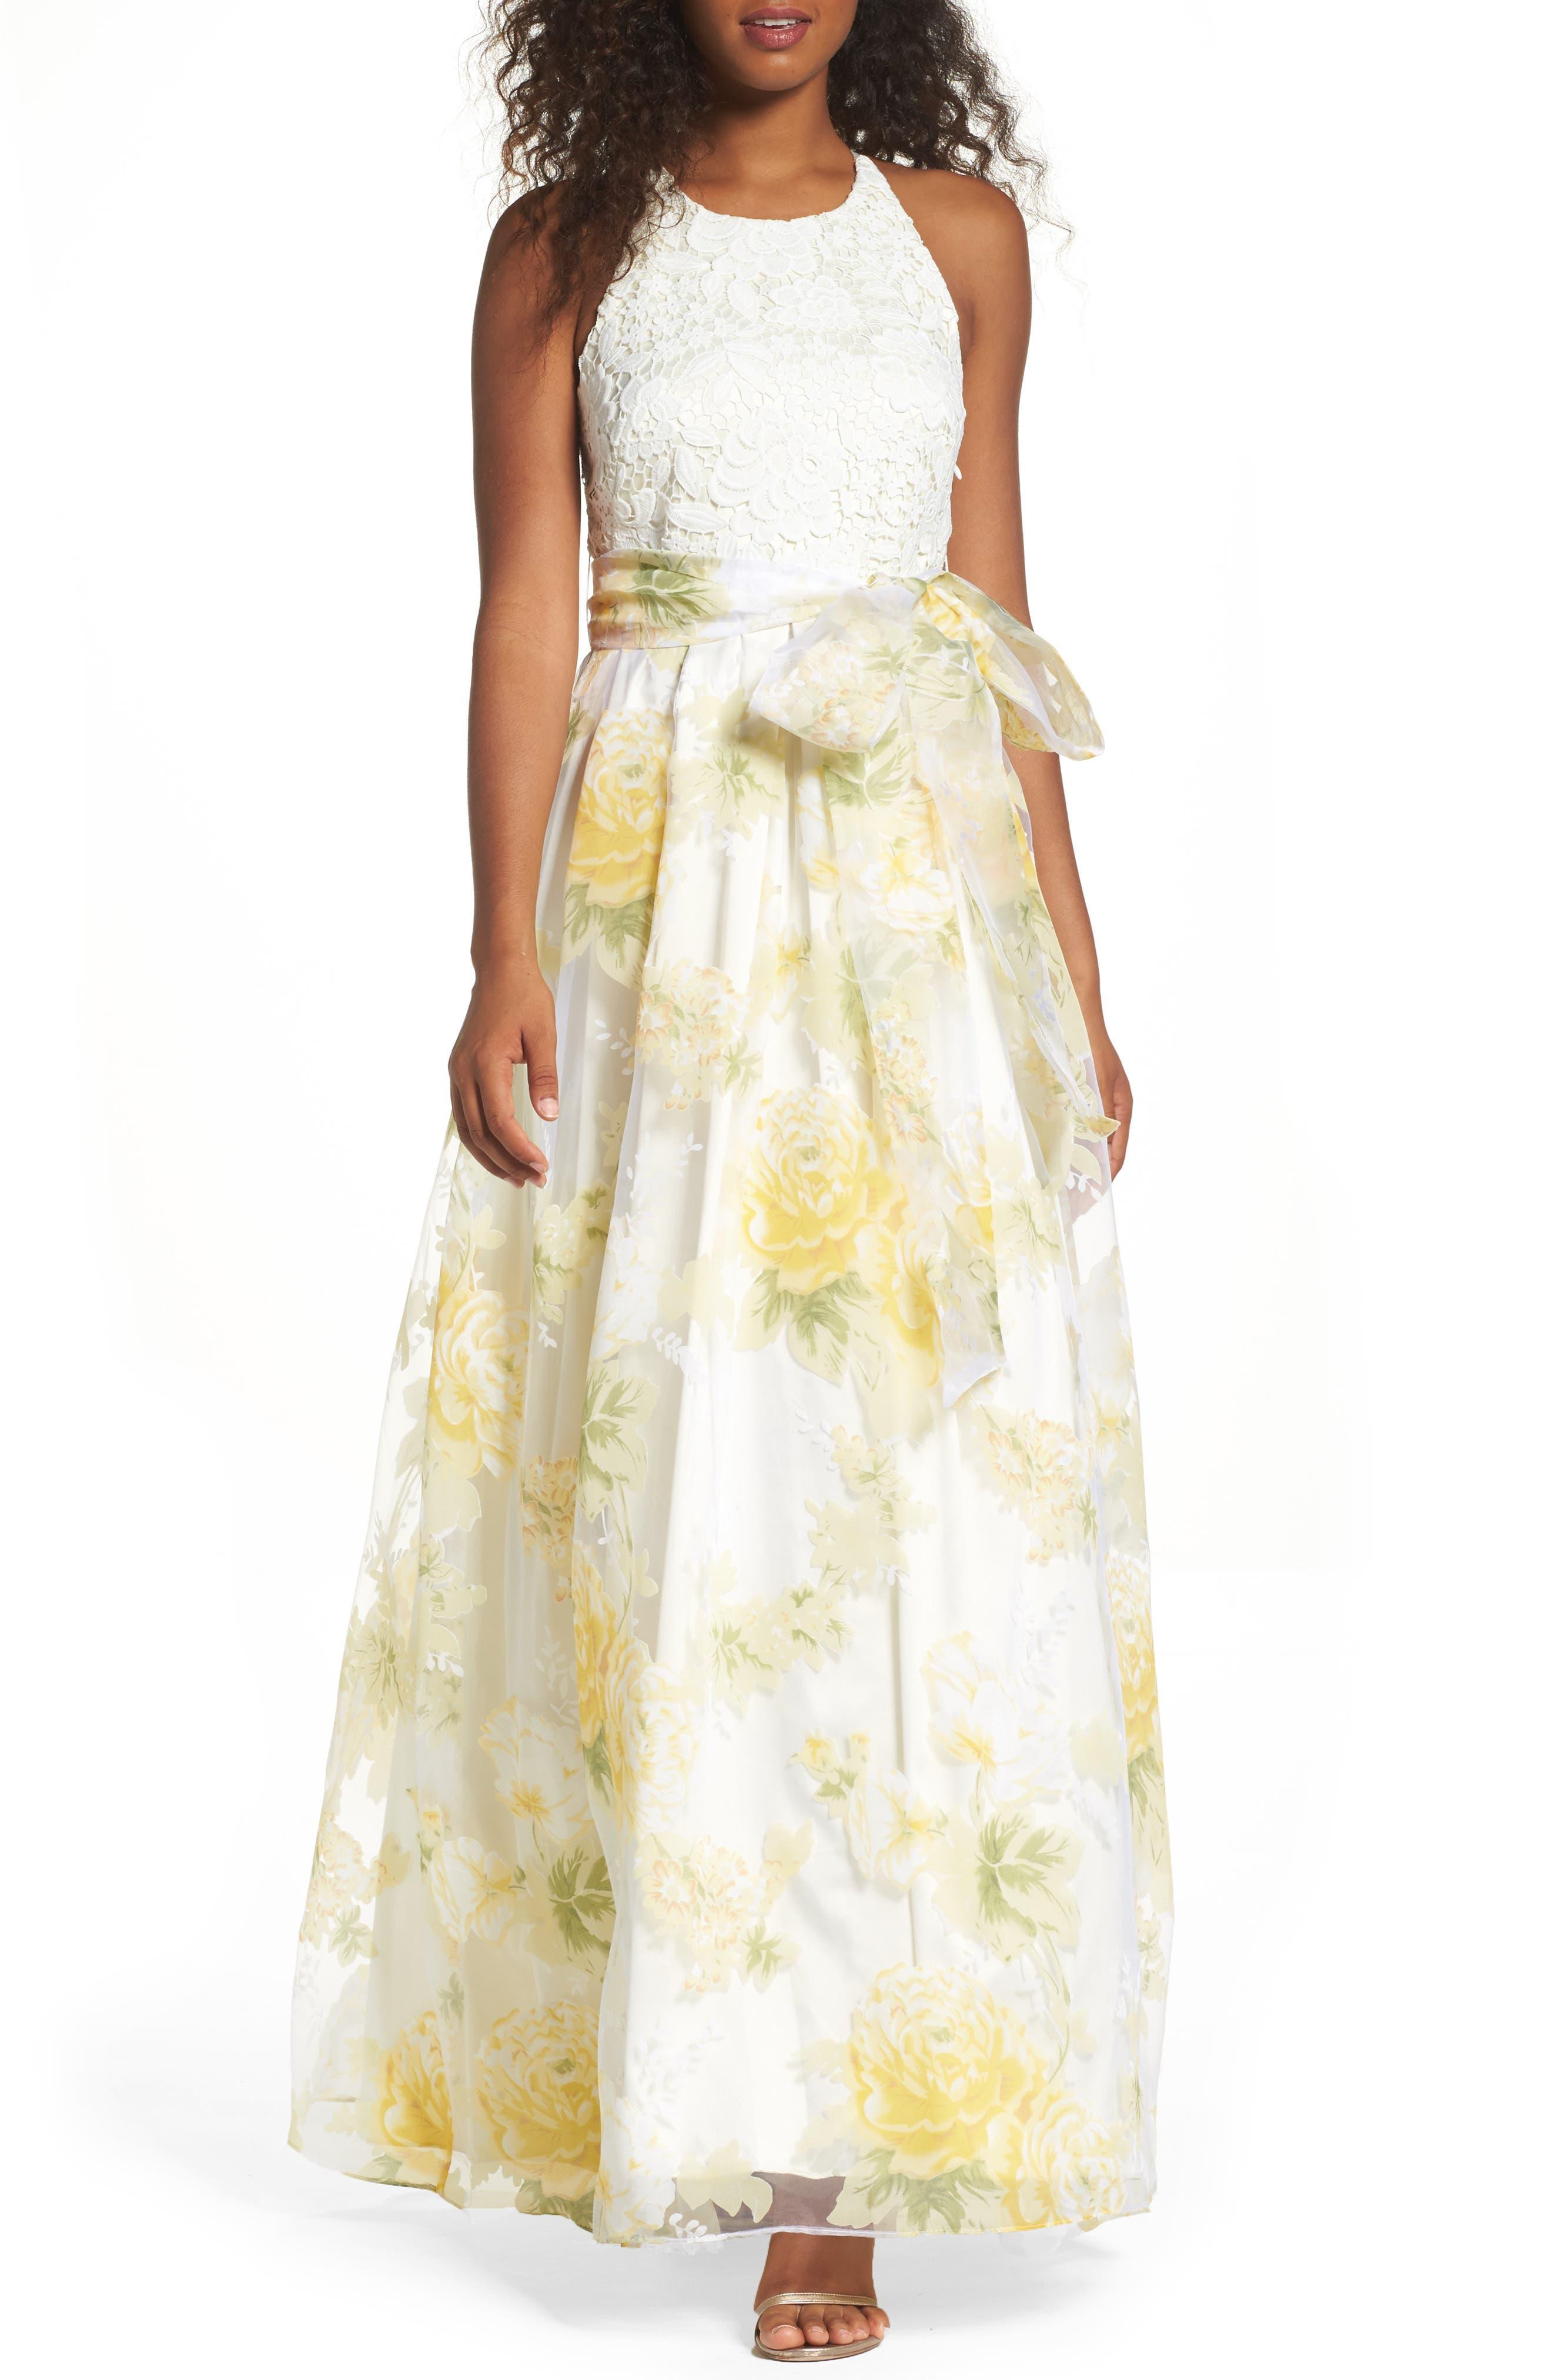 Alternate Image 1 Selected - Eliza J Crochet & Floral Organza Halter Gown